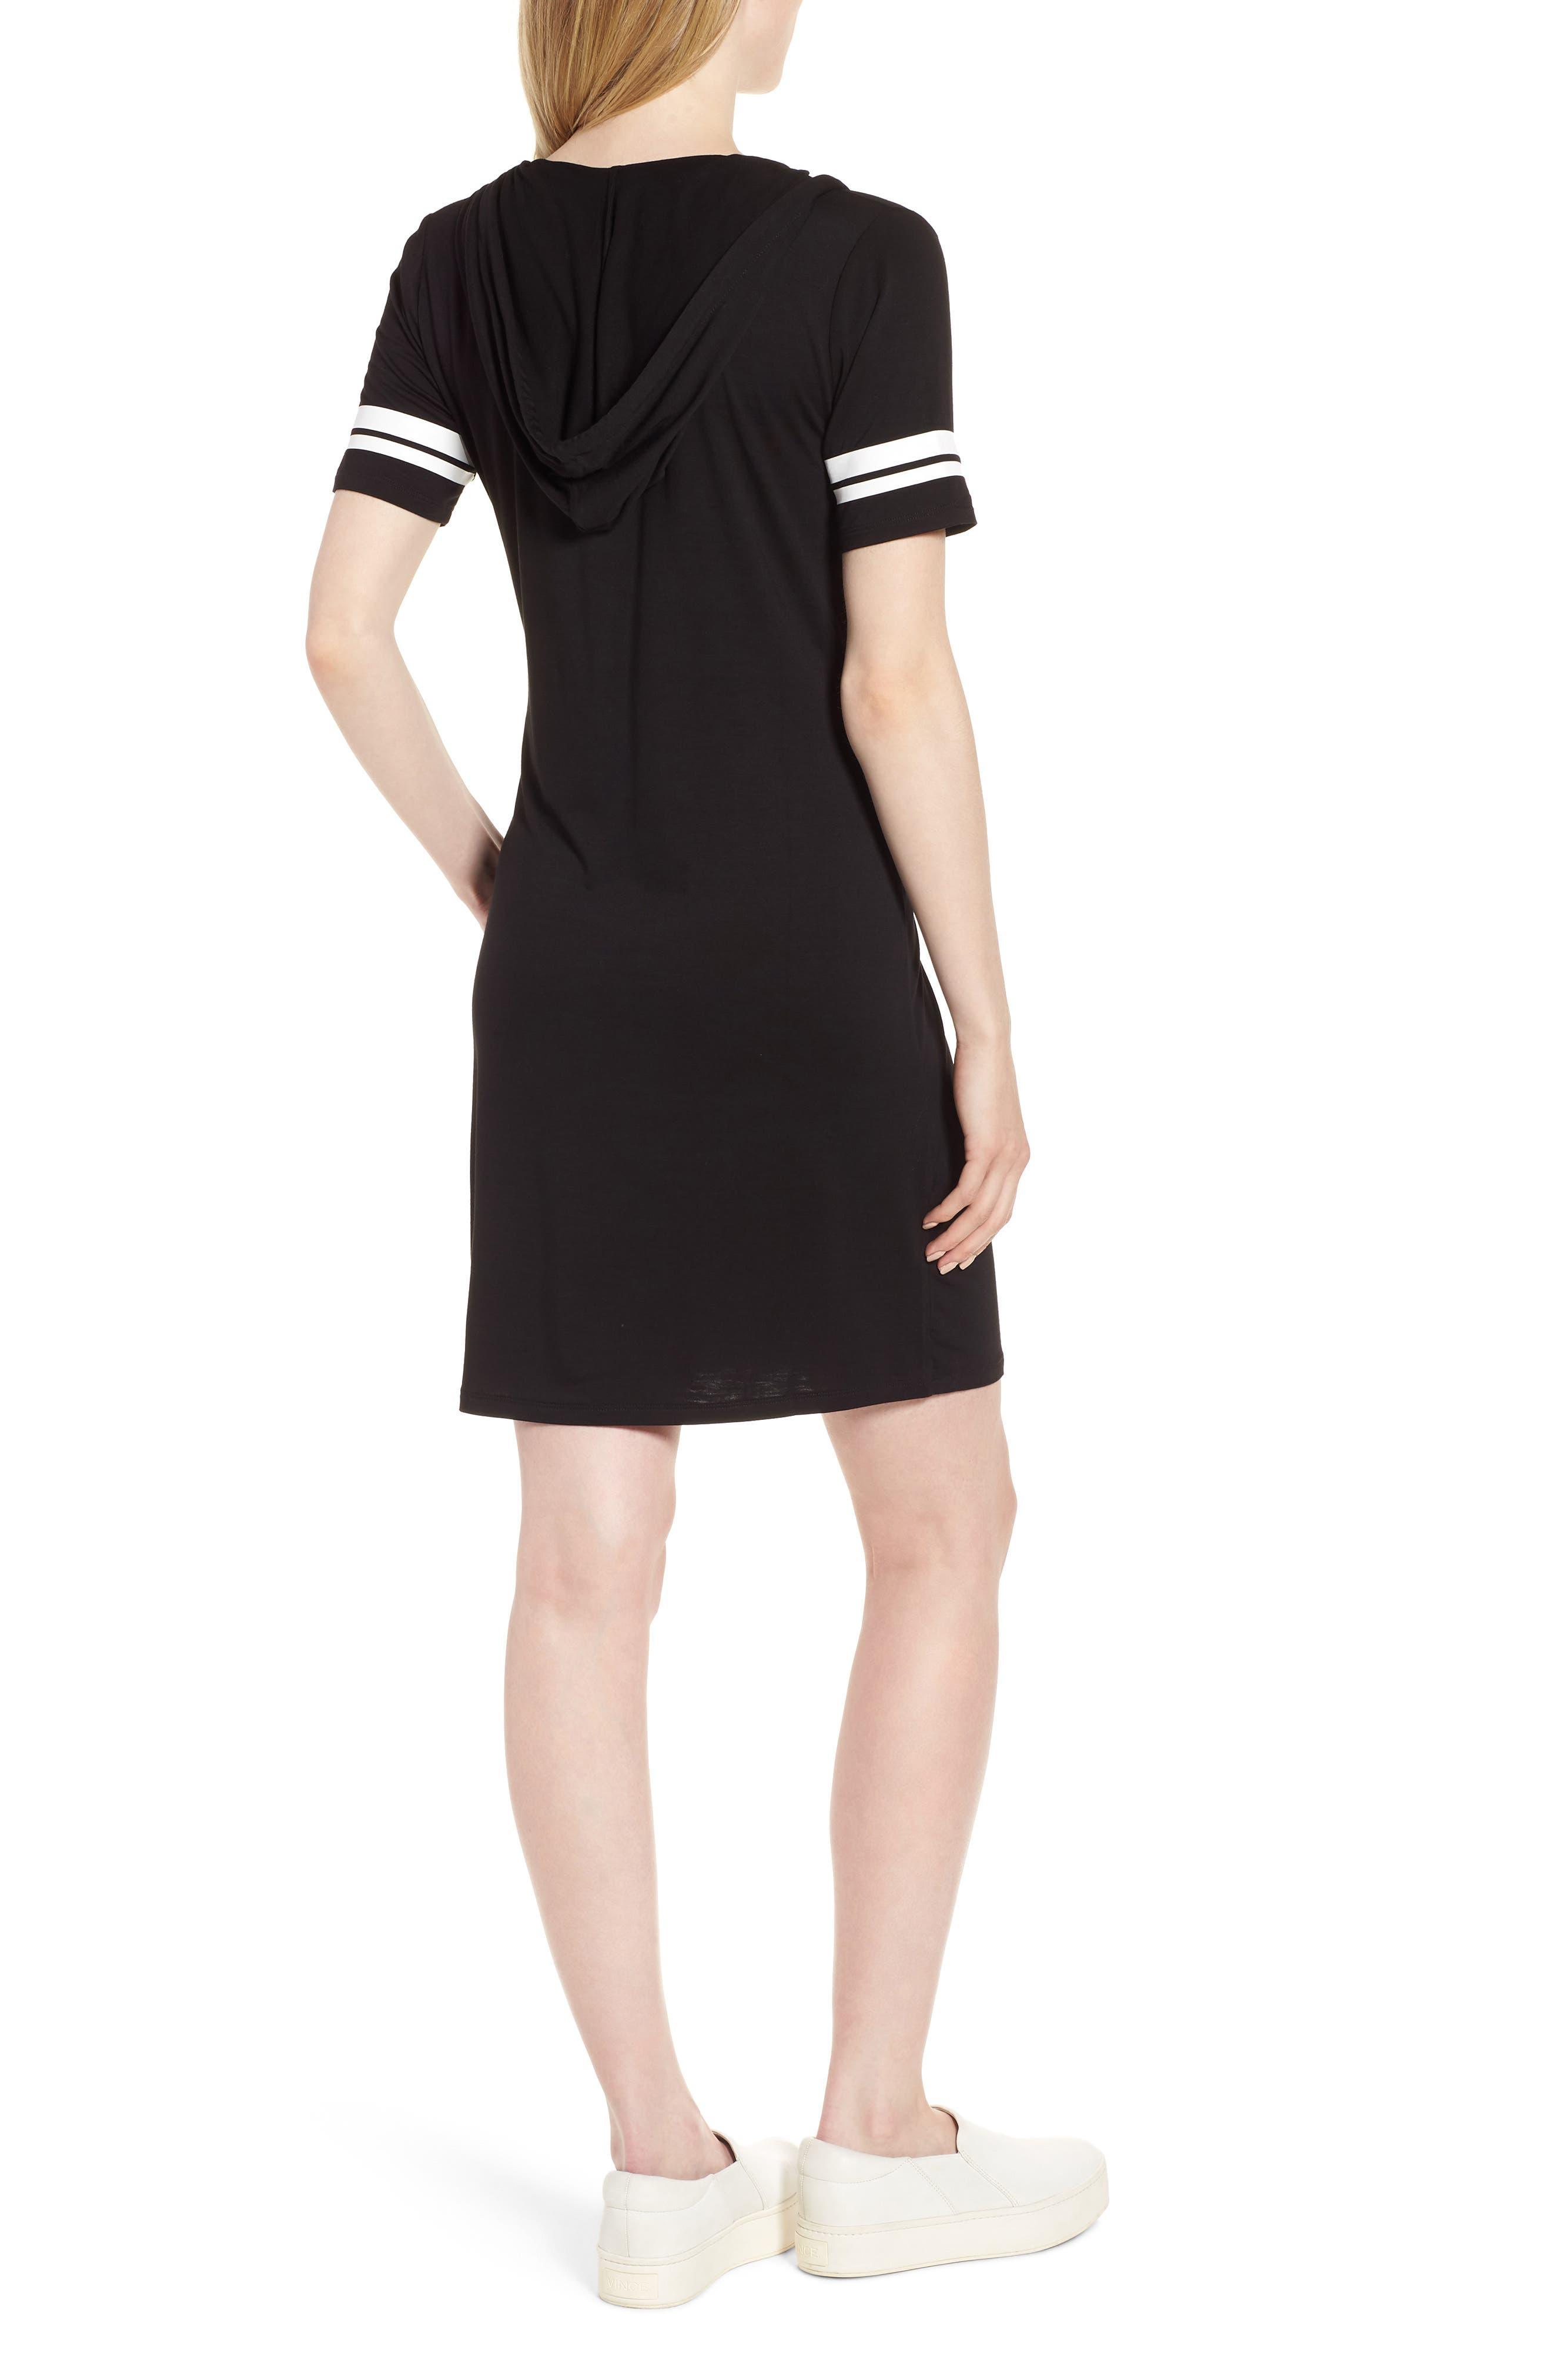 MICHAEL Michal Kors Stripe Sleeve Hoodie Dress,                             Alternate thumbnail 2, color,                             001